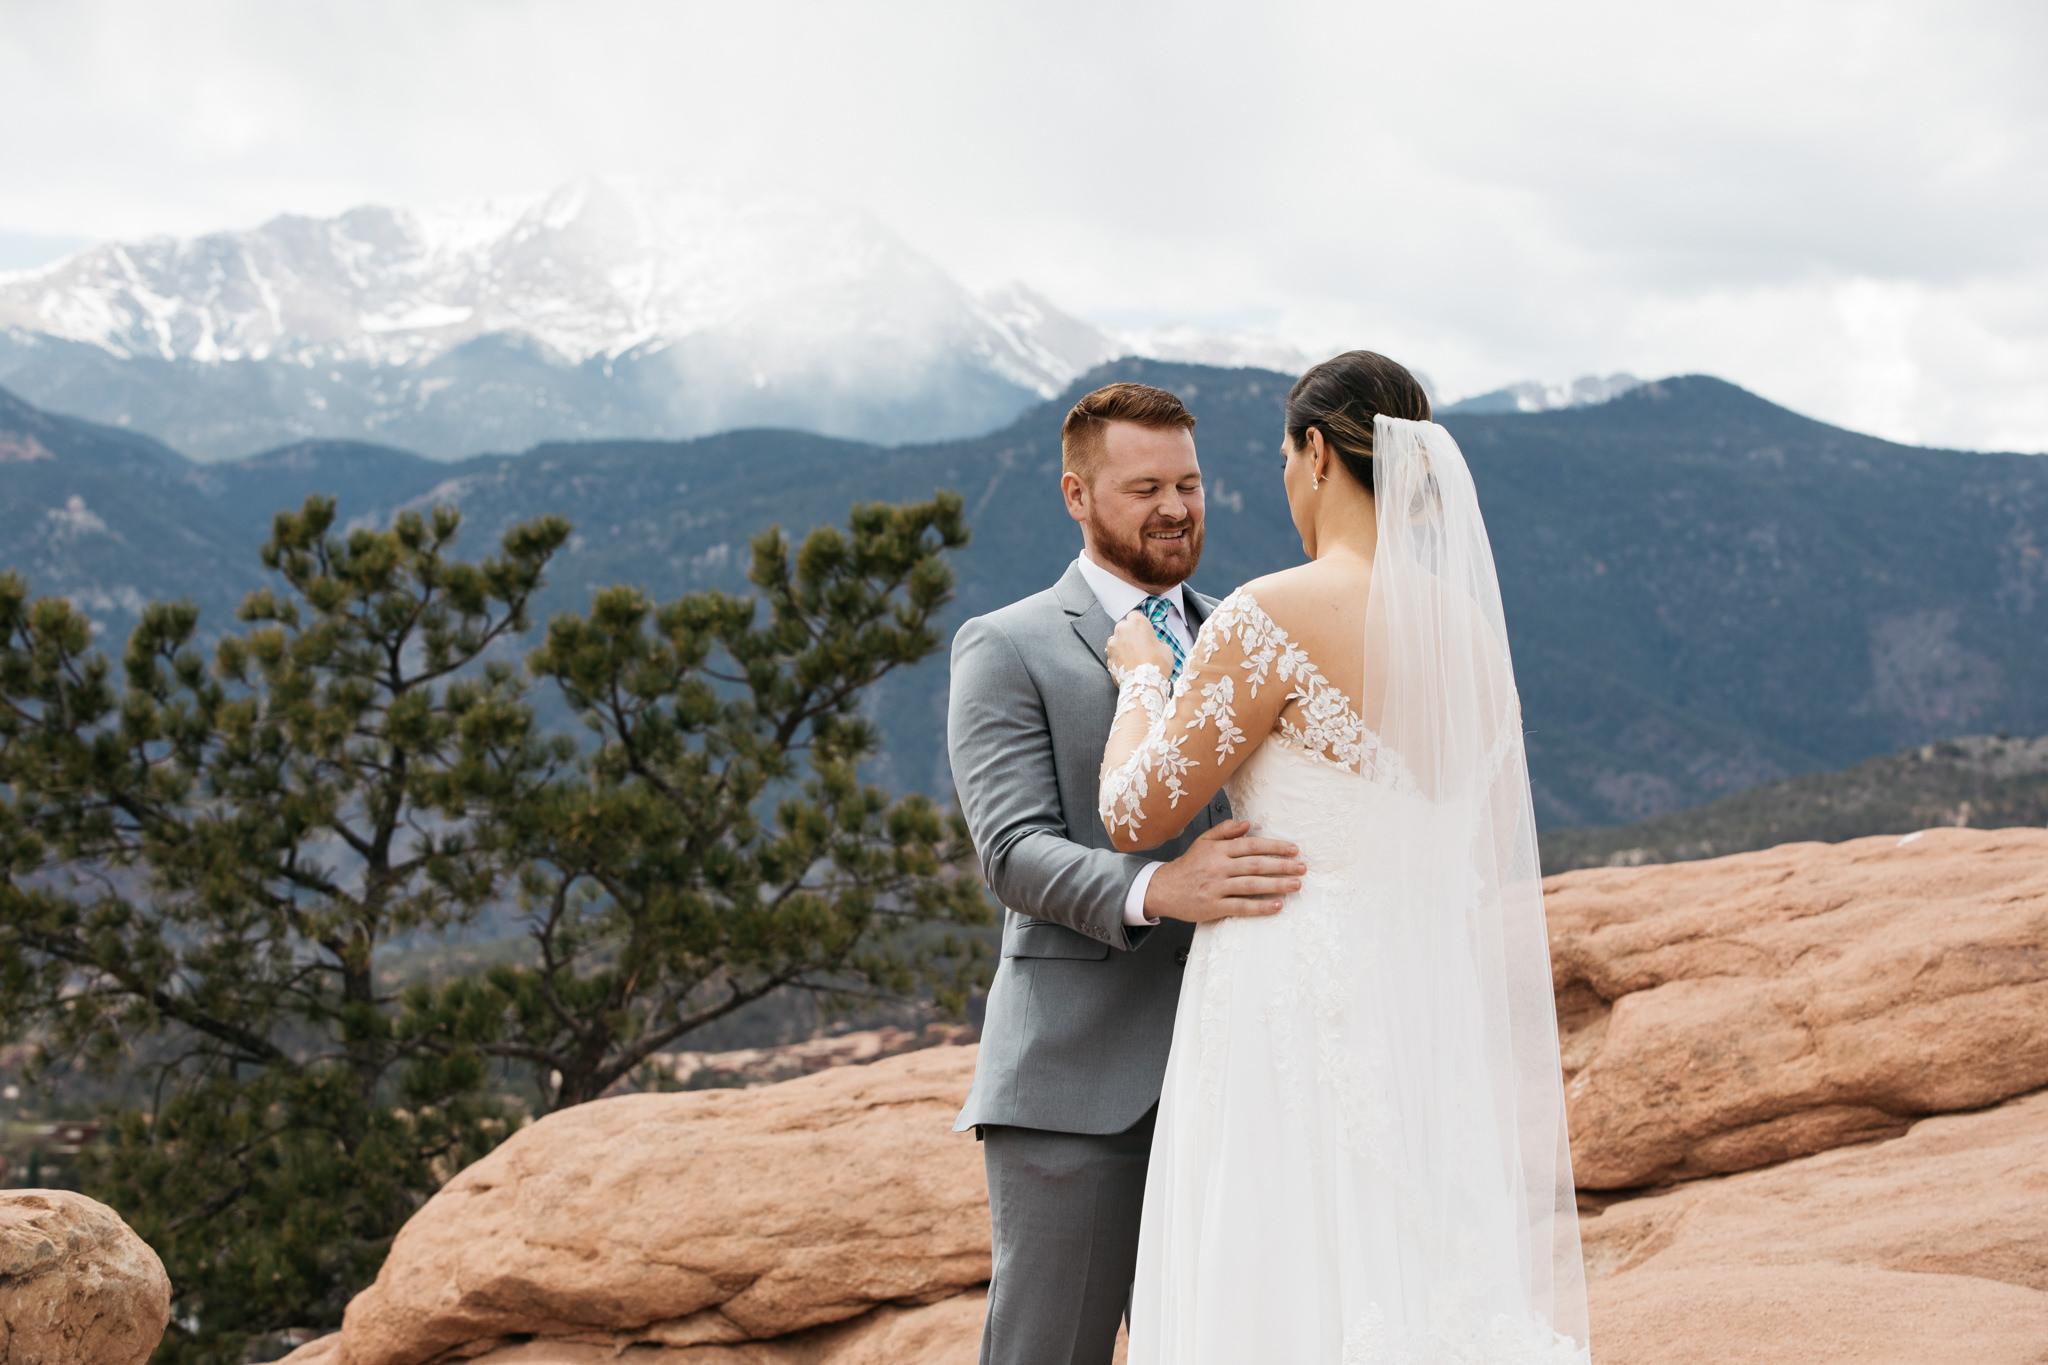 phantom-canyon-brewery-colorado-springs-wedding-photographer-206.jpg